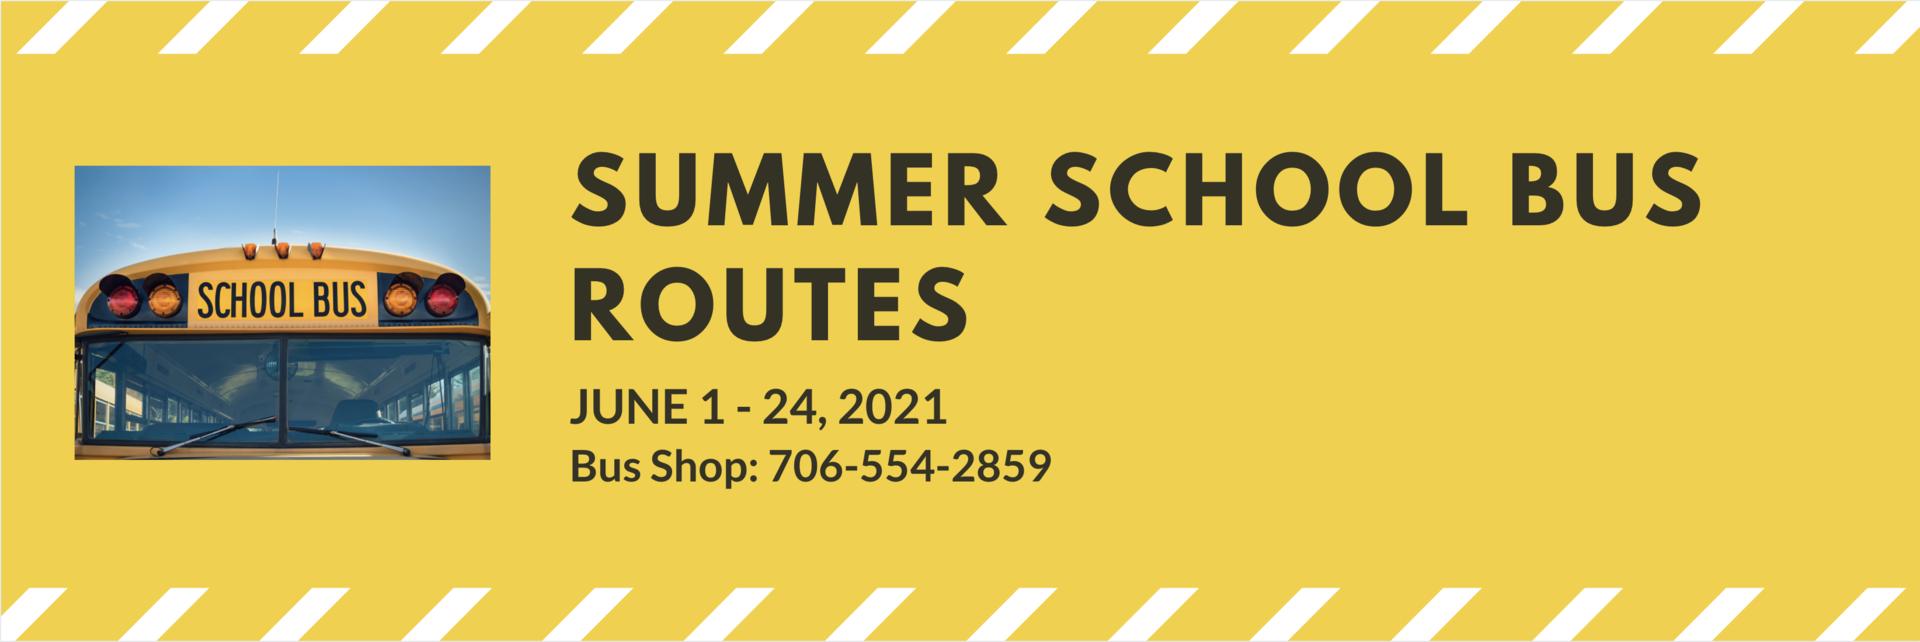 summer school bus routes